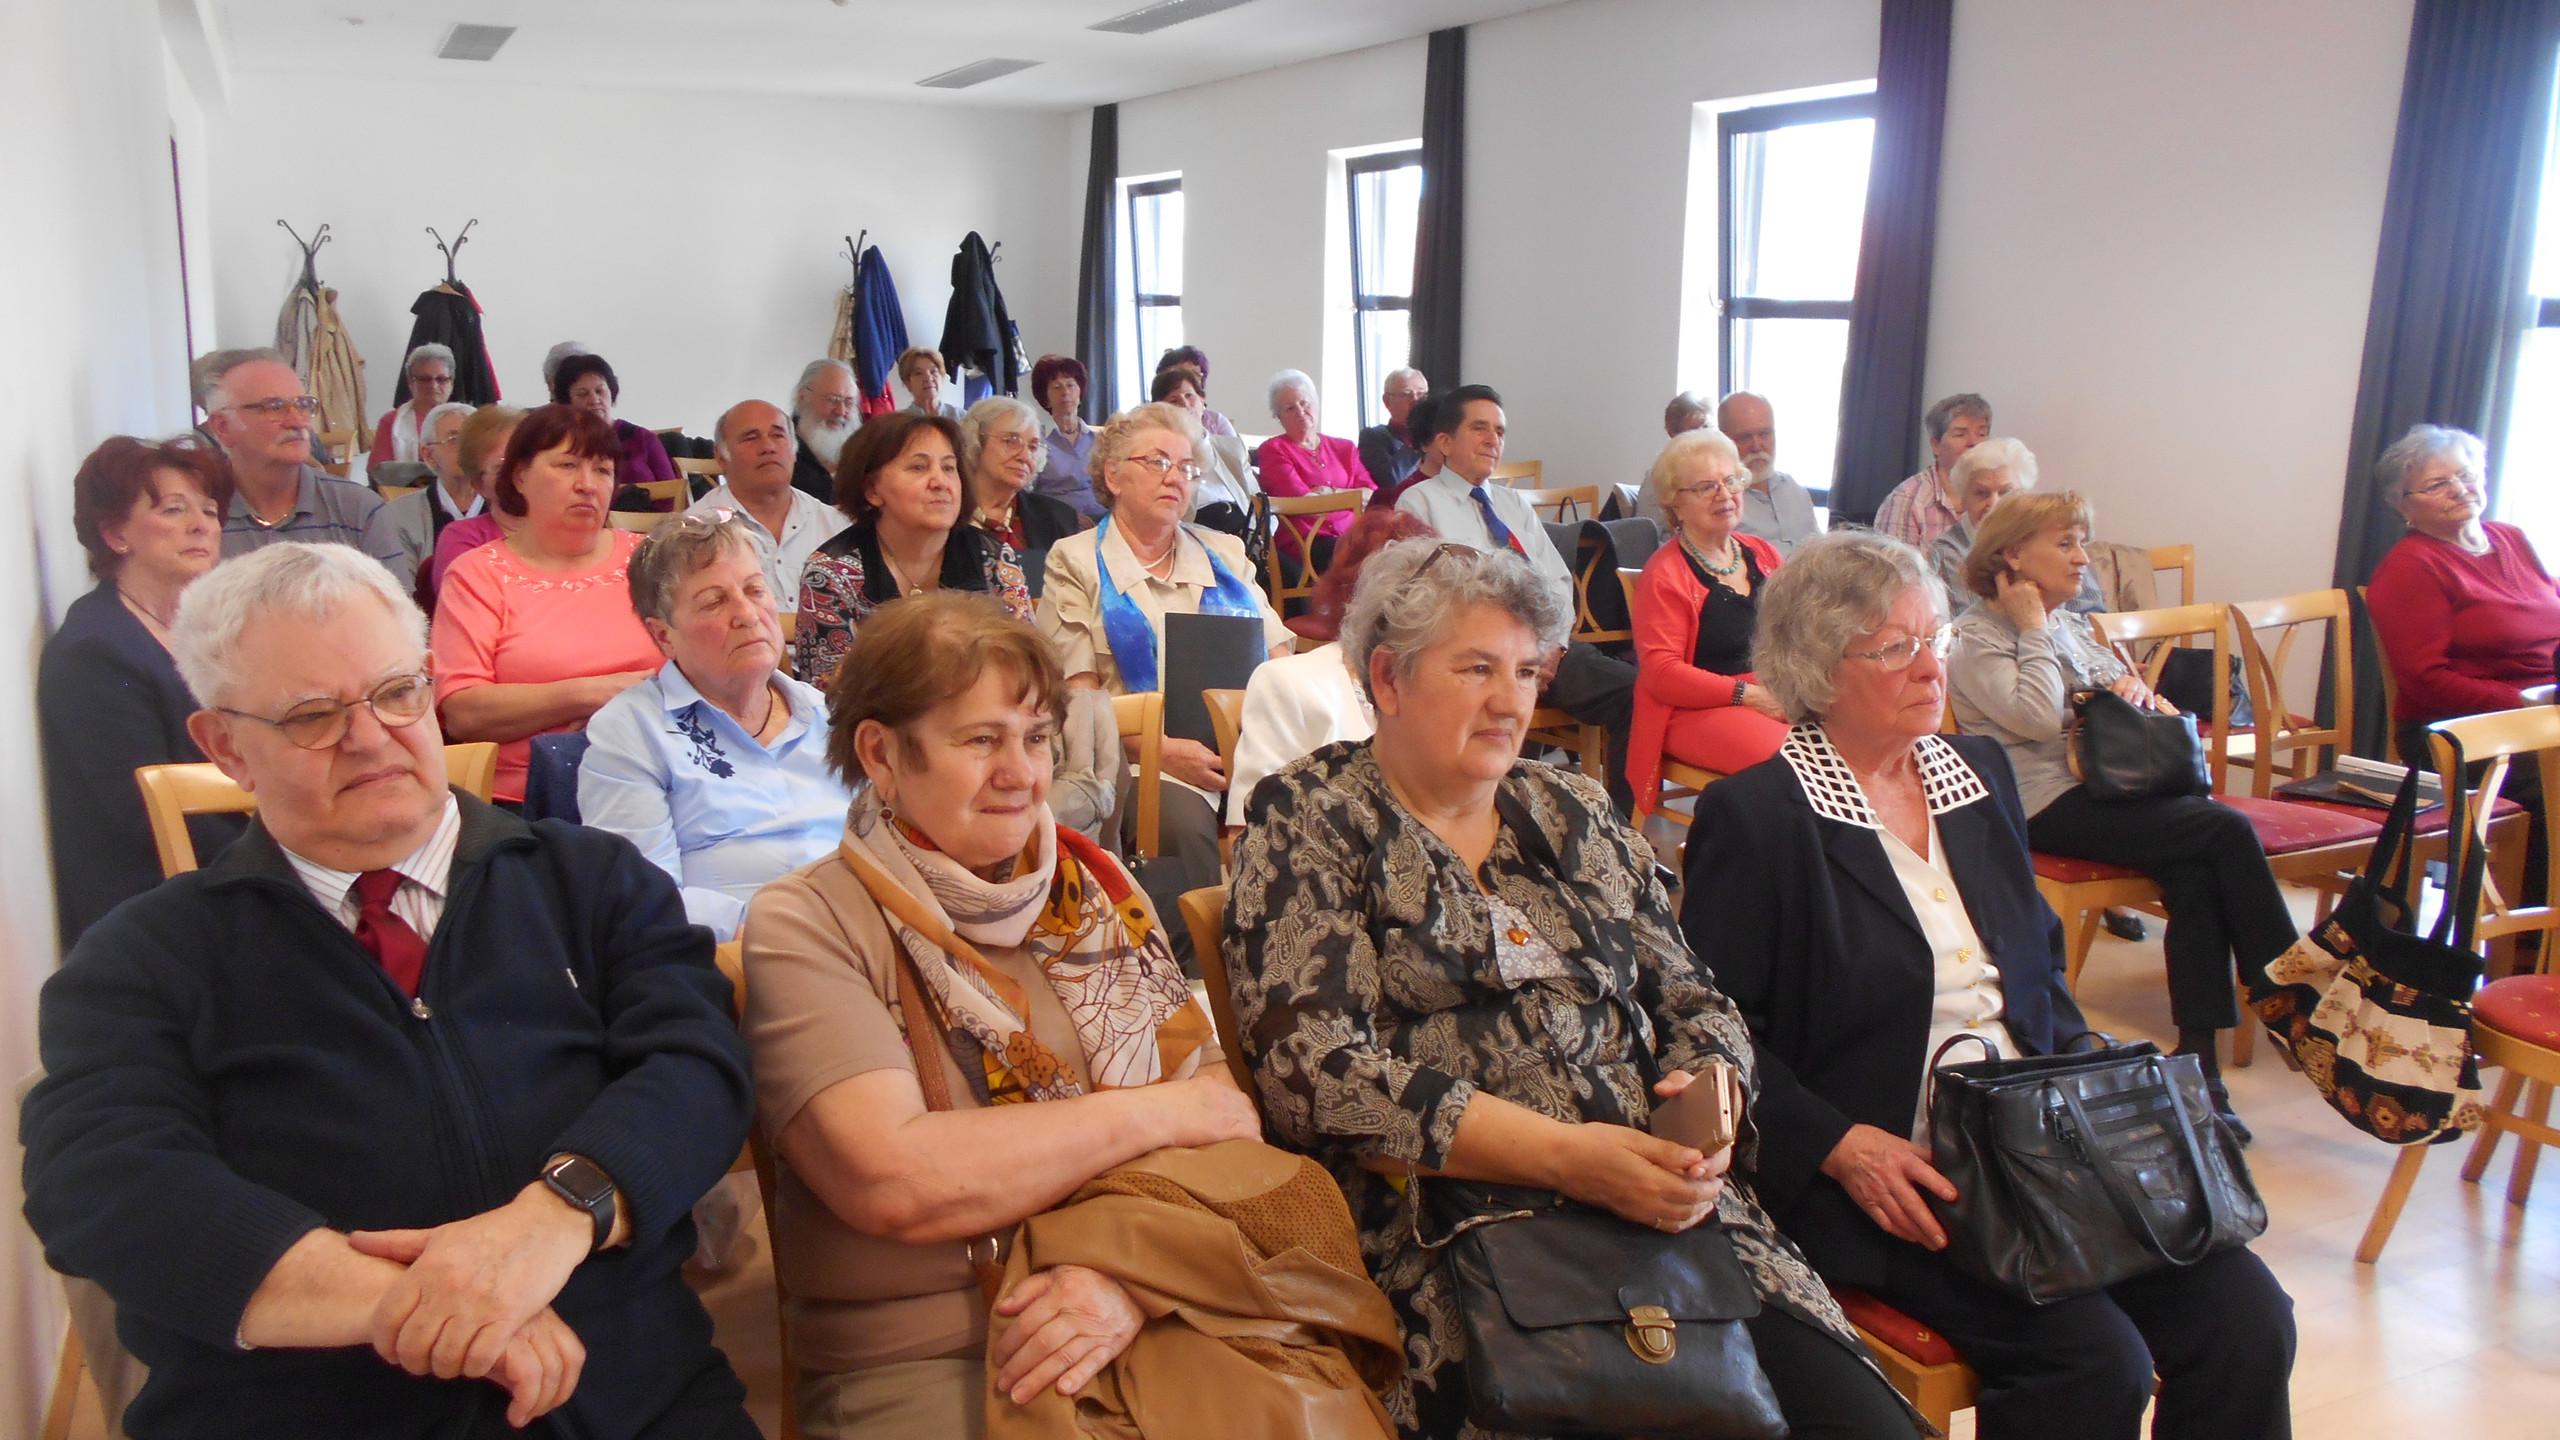 Közönség1